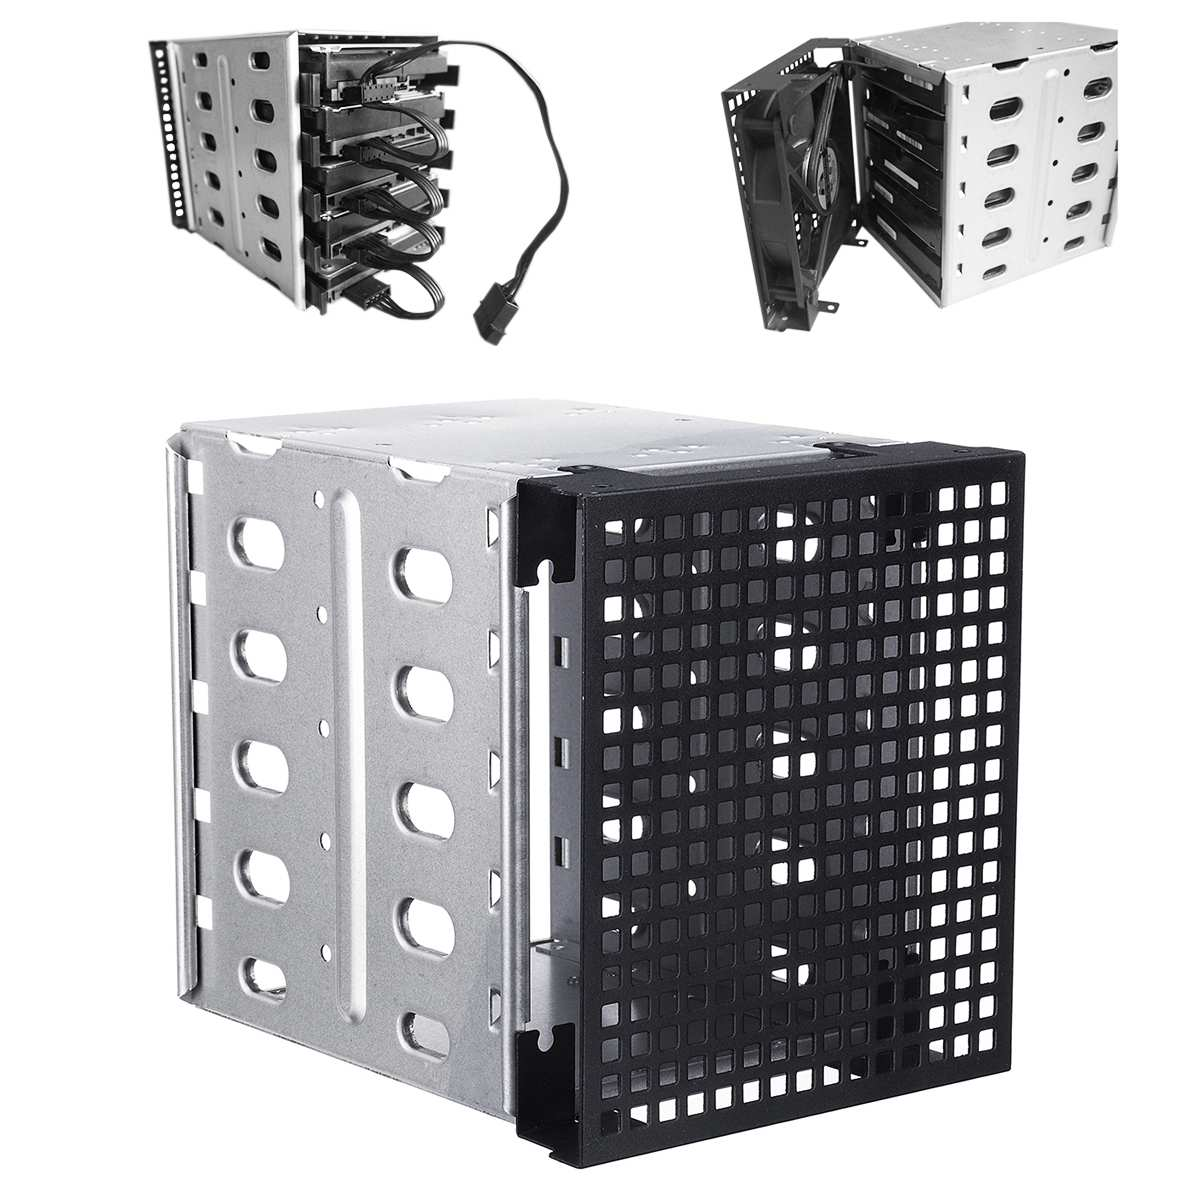 "5,25 ""a 5x3,5"" SATA SAS jaula de unidad de disco duro Rack Disco Duro bandeja Caddy Adaptador convertidor con ventilador ranuras de espacio"